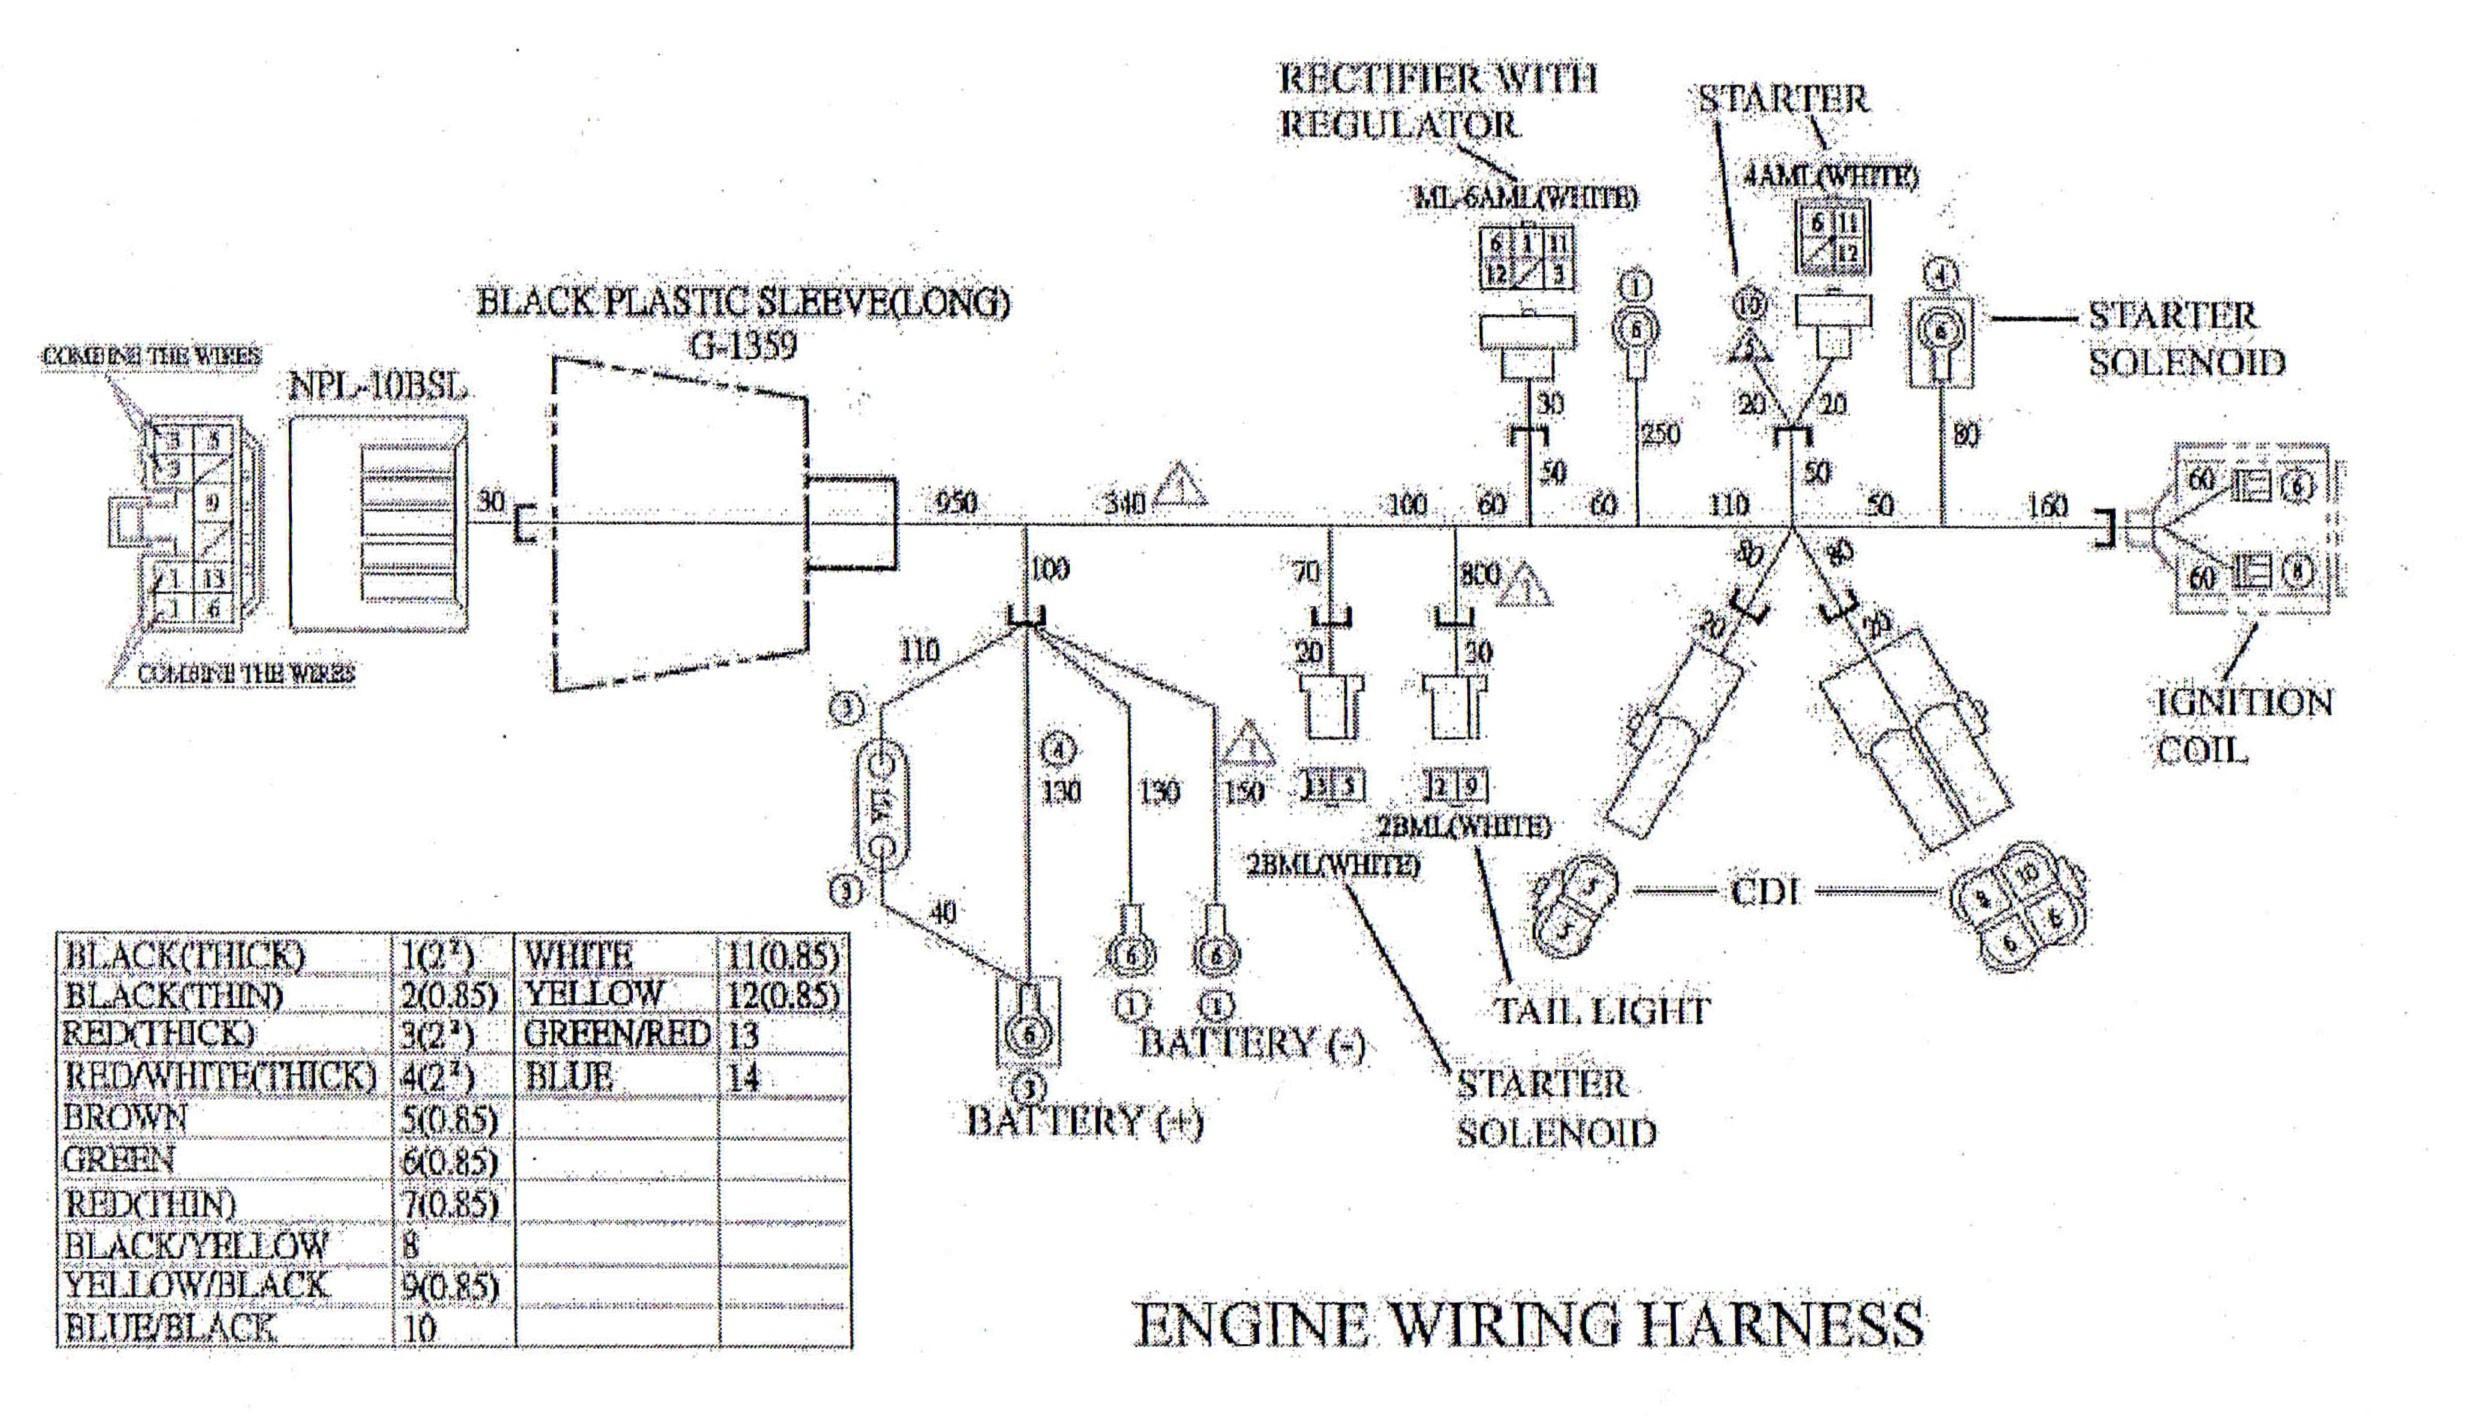 Engine Starter Diagram Inspirational Basic Wiring Diagrams Diagram Of Engine Starter Diagram